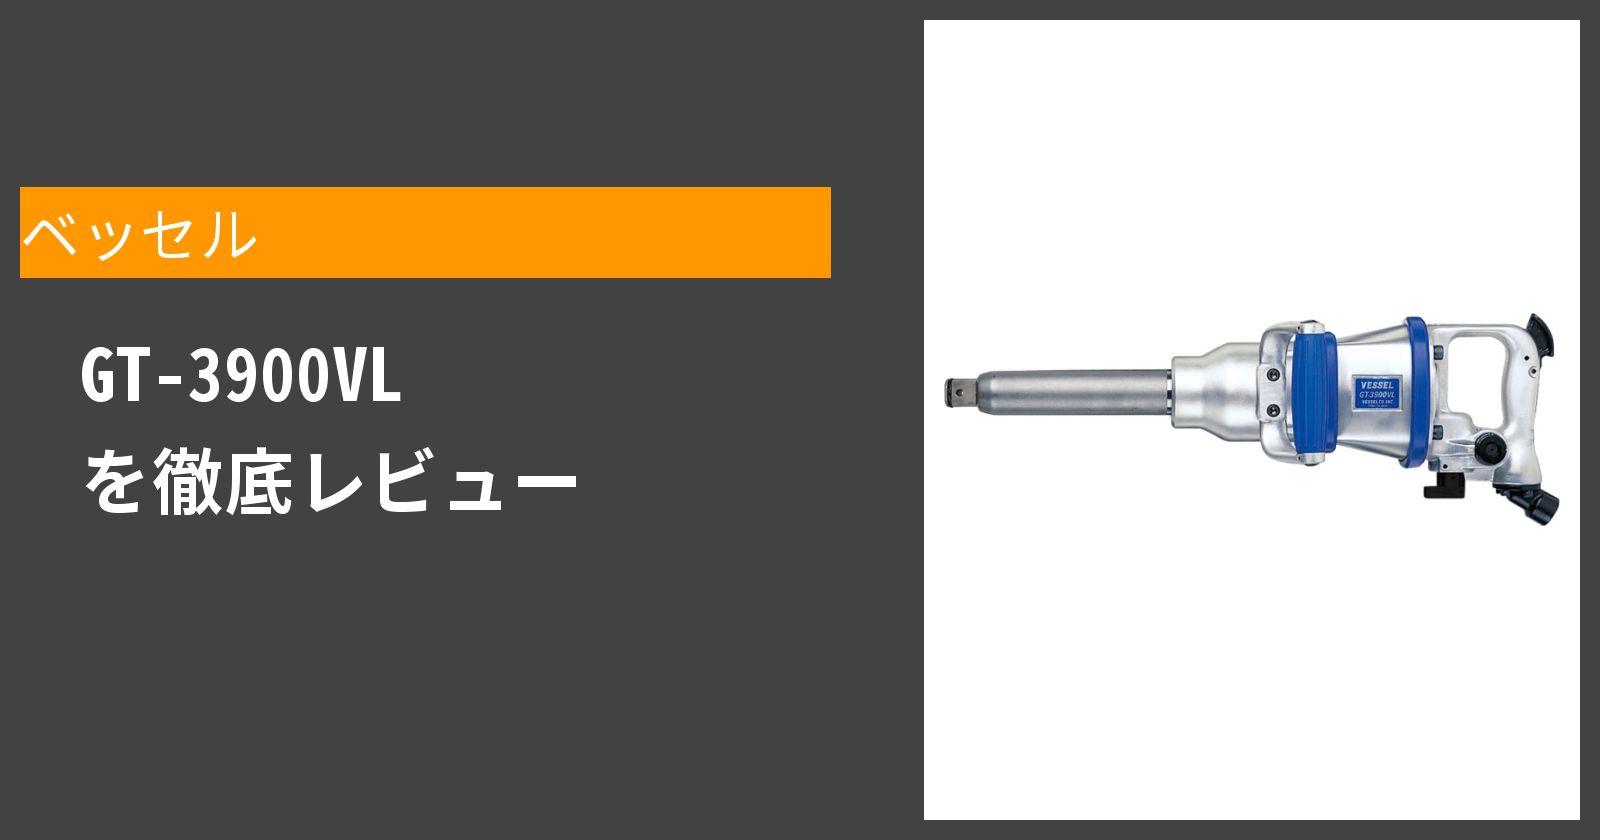 GT-3900VLを徹底評価